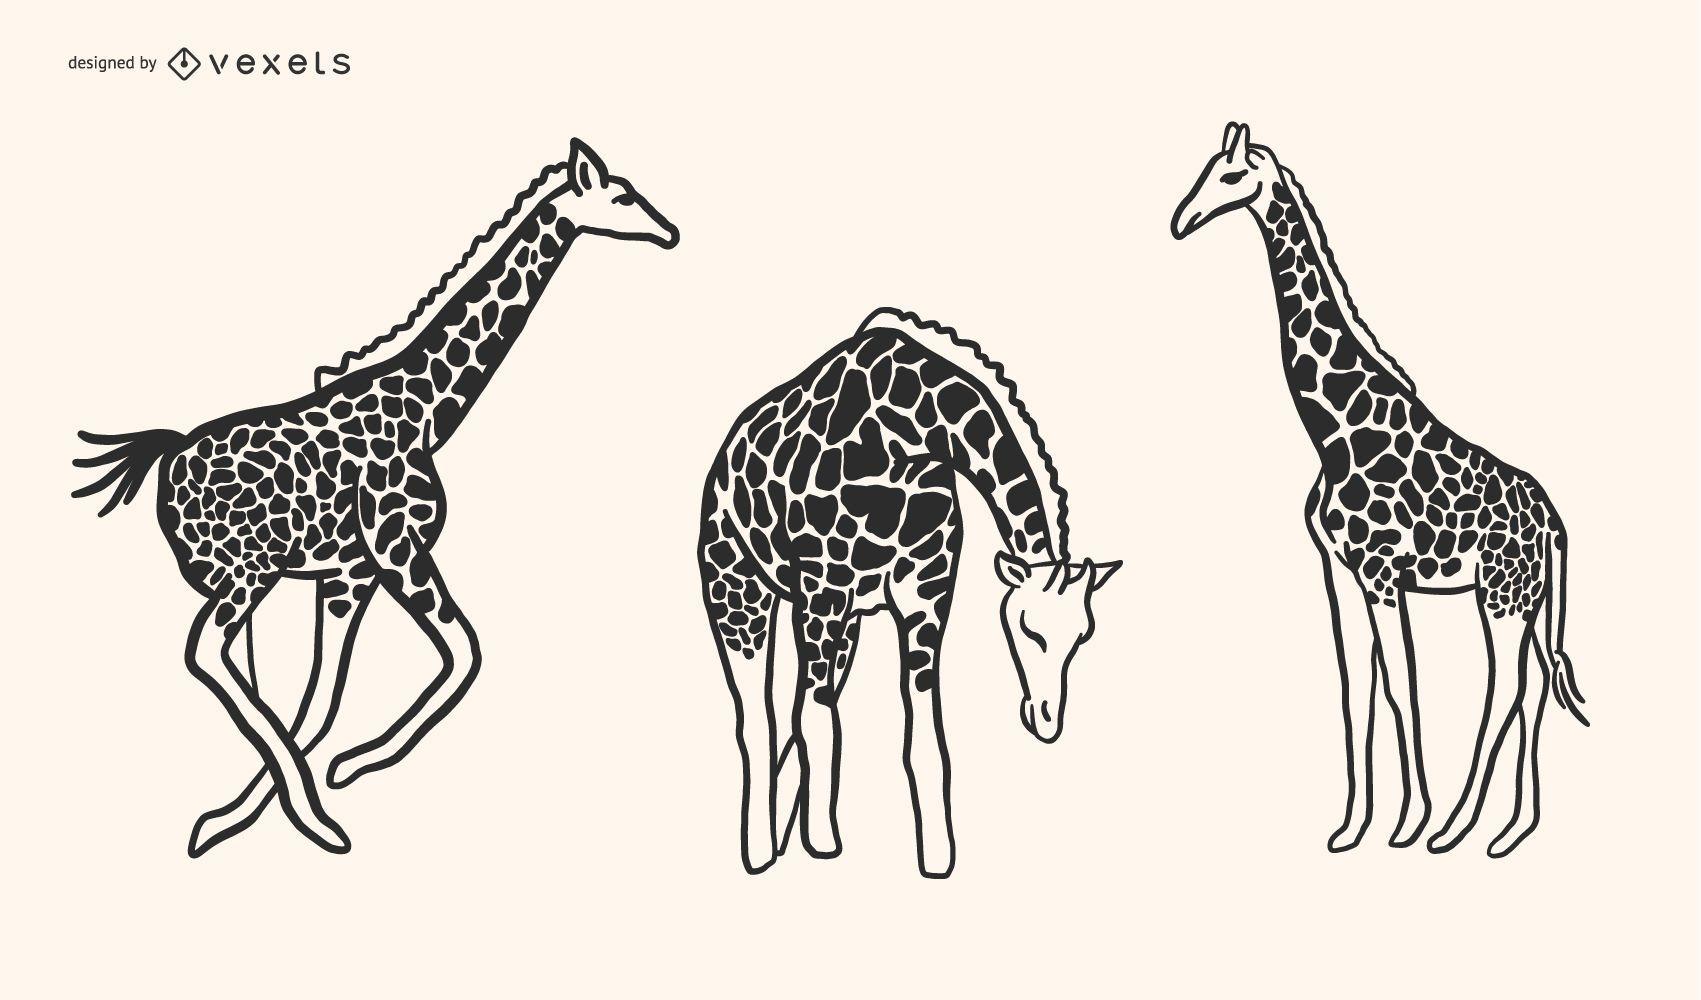 Diseño de vector de estilo Doodle de jirafa